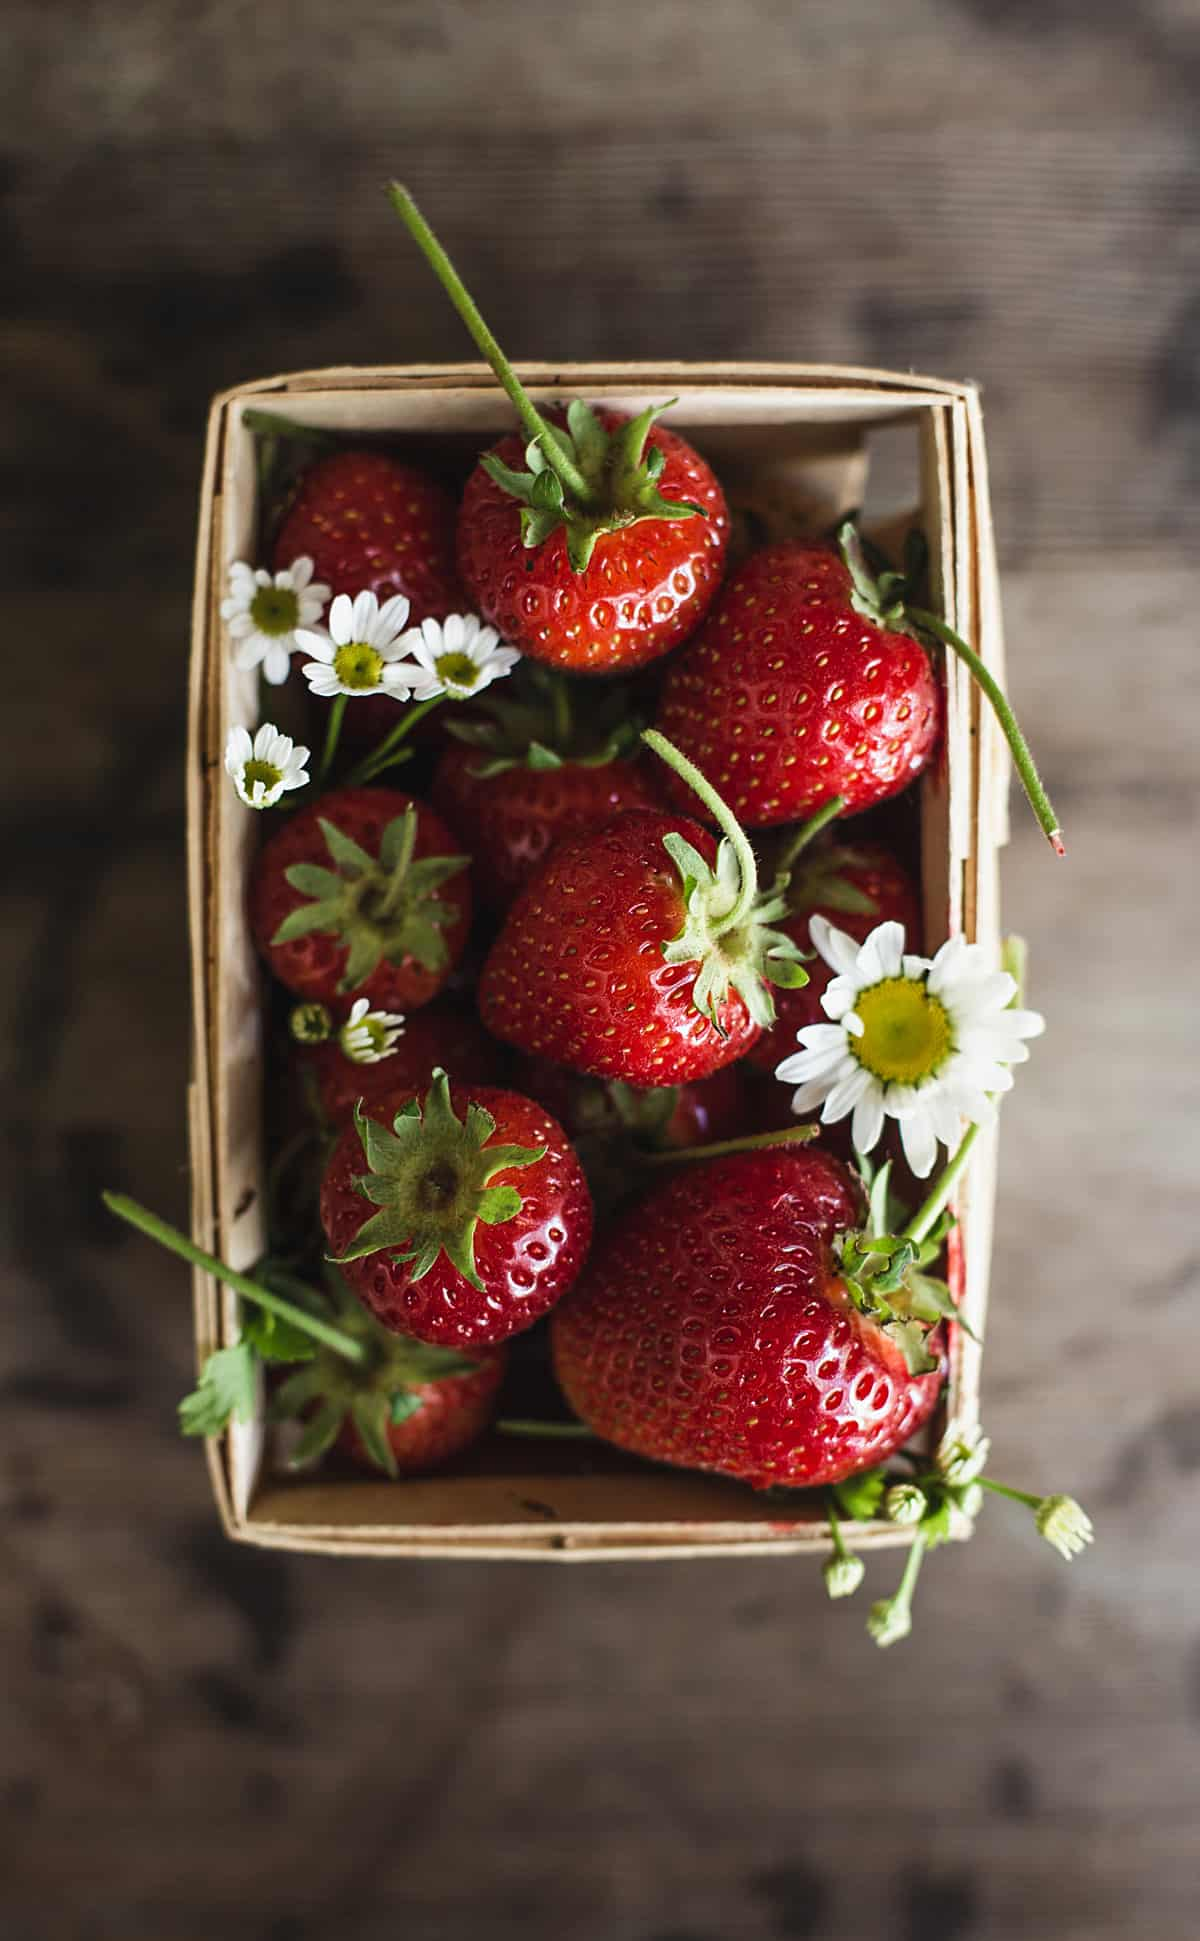 Strawberry Balsamic Almond Milk Ice Cream a delightful dairy free ice cream with almond milk custard and roasted balsamic strawberries. non dairy | homemade ice cream | dairy free dessert